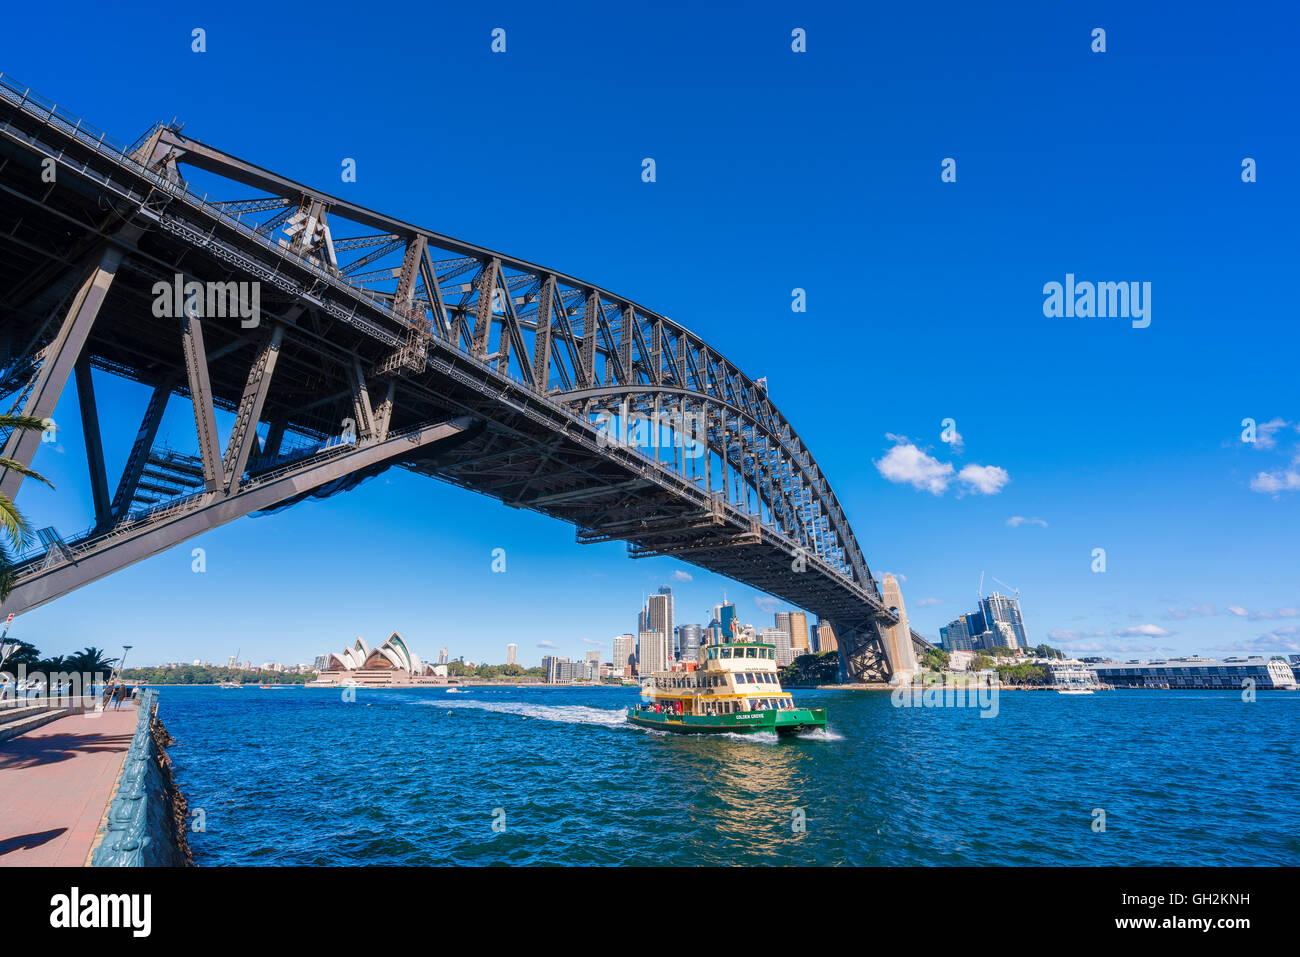 Sydney CBD in daytime - Stock Image